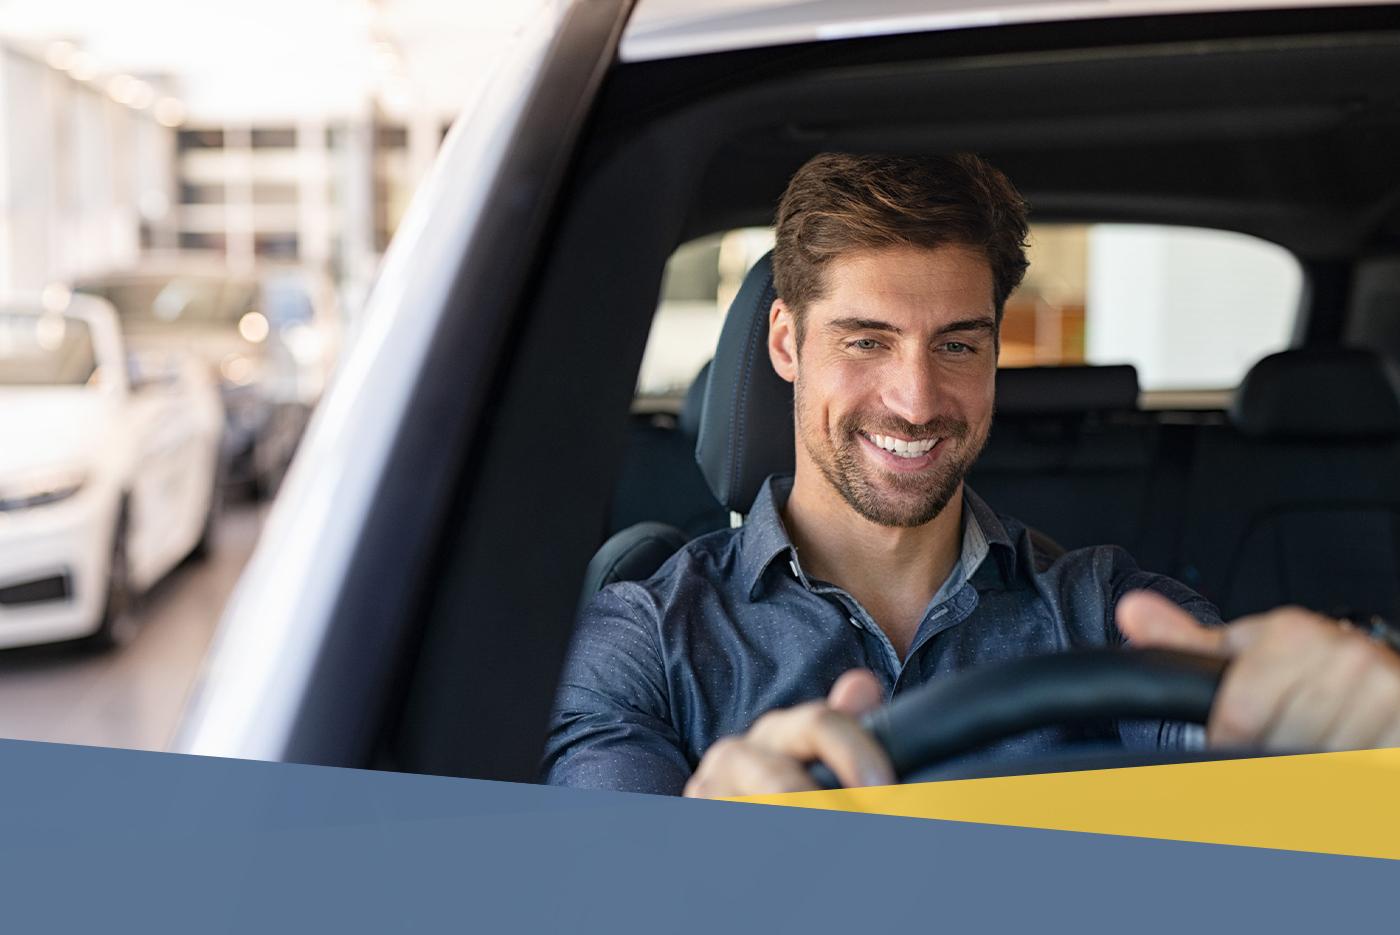 individual behind the wheel